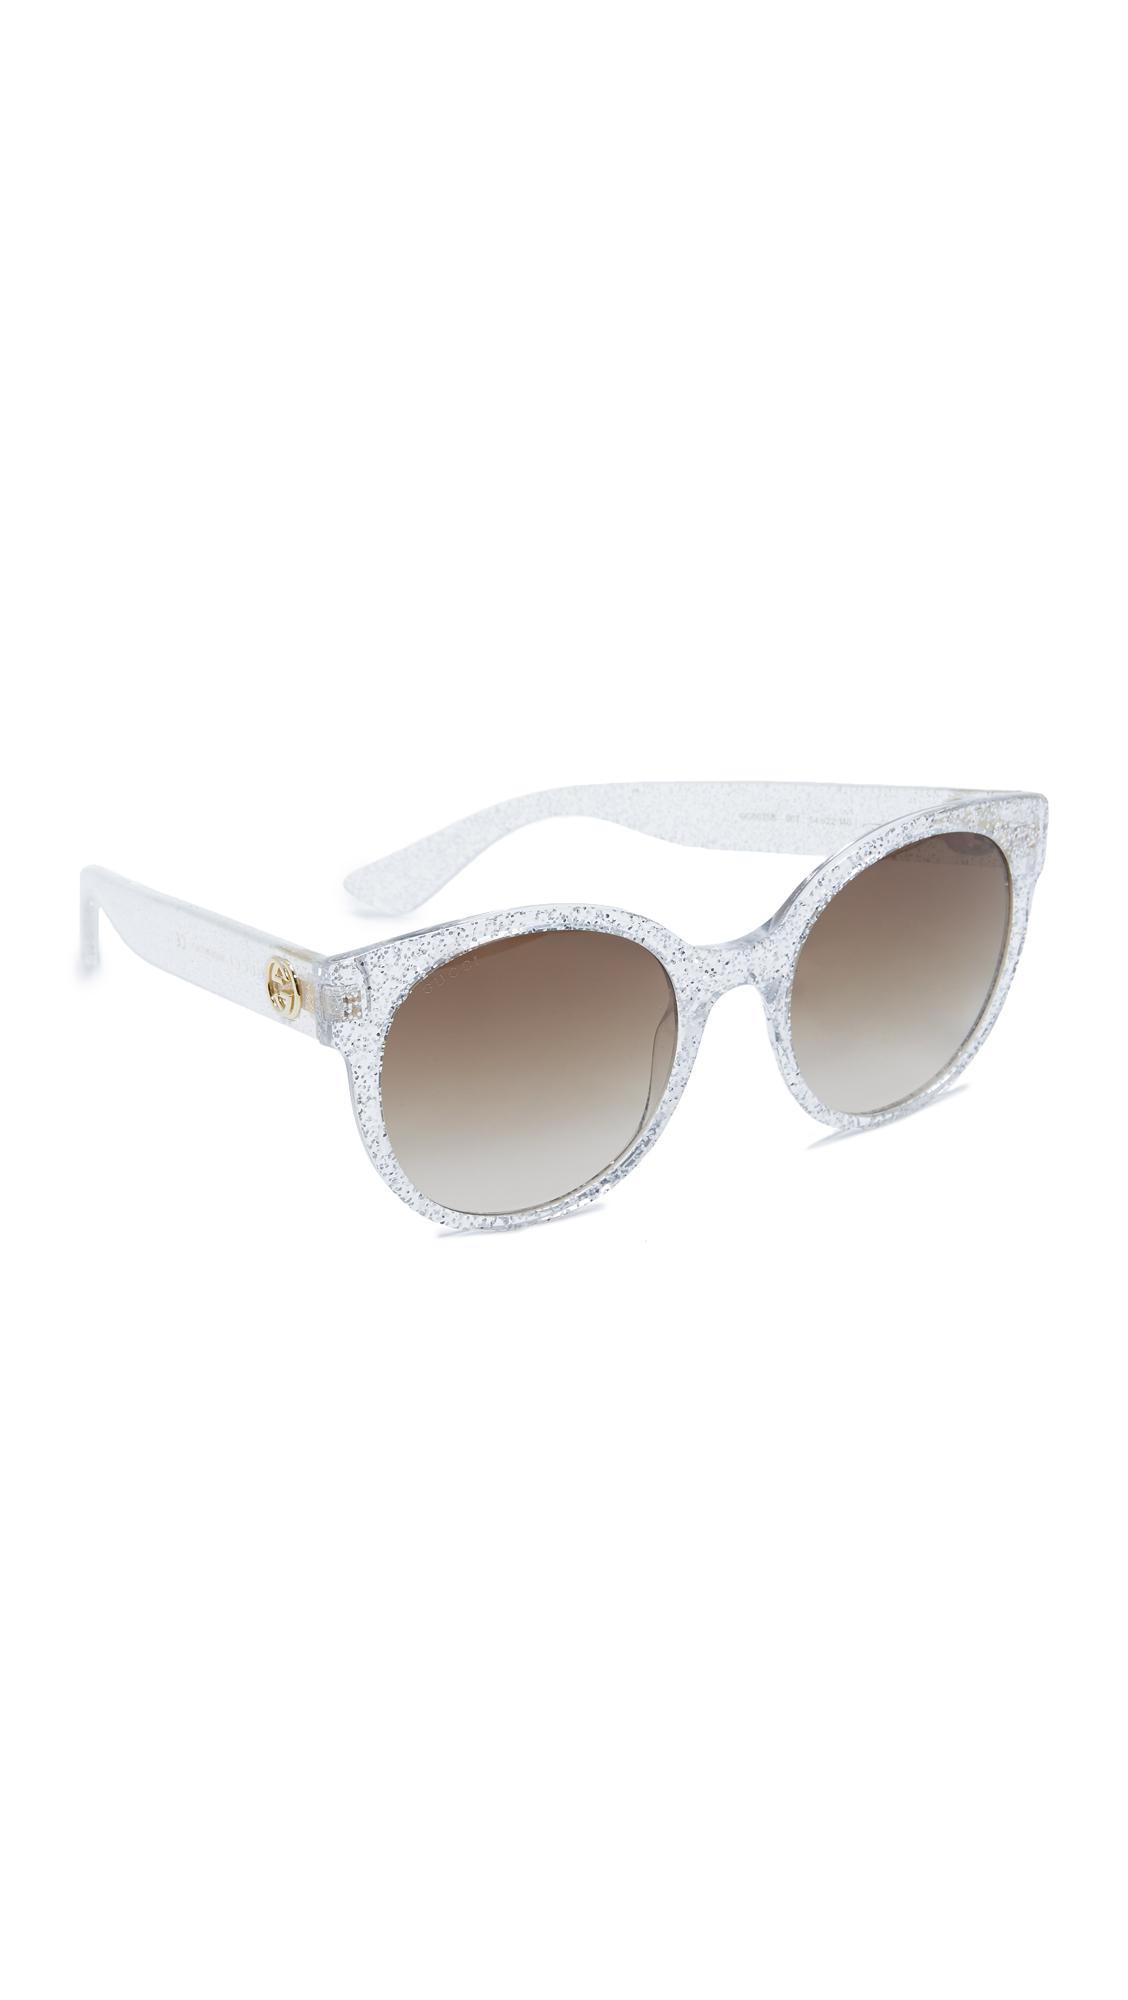 Gucci Urban Pop Round Sunglasses - Glitter Silver/Brown at Shopbop